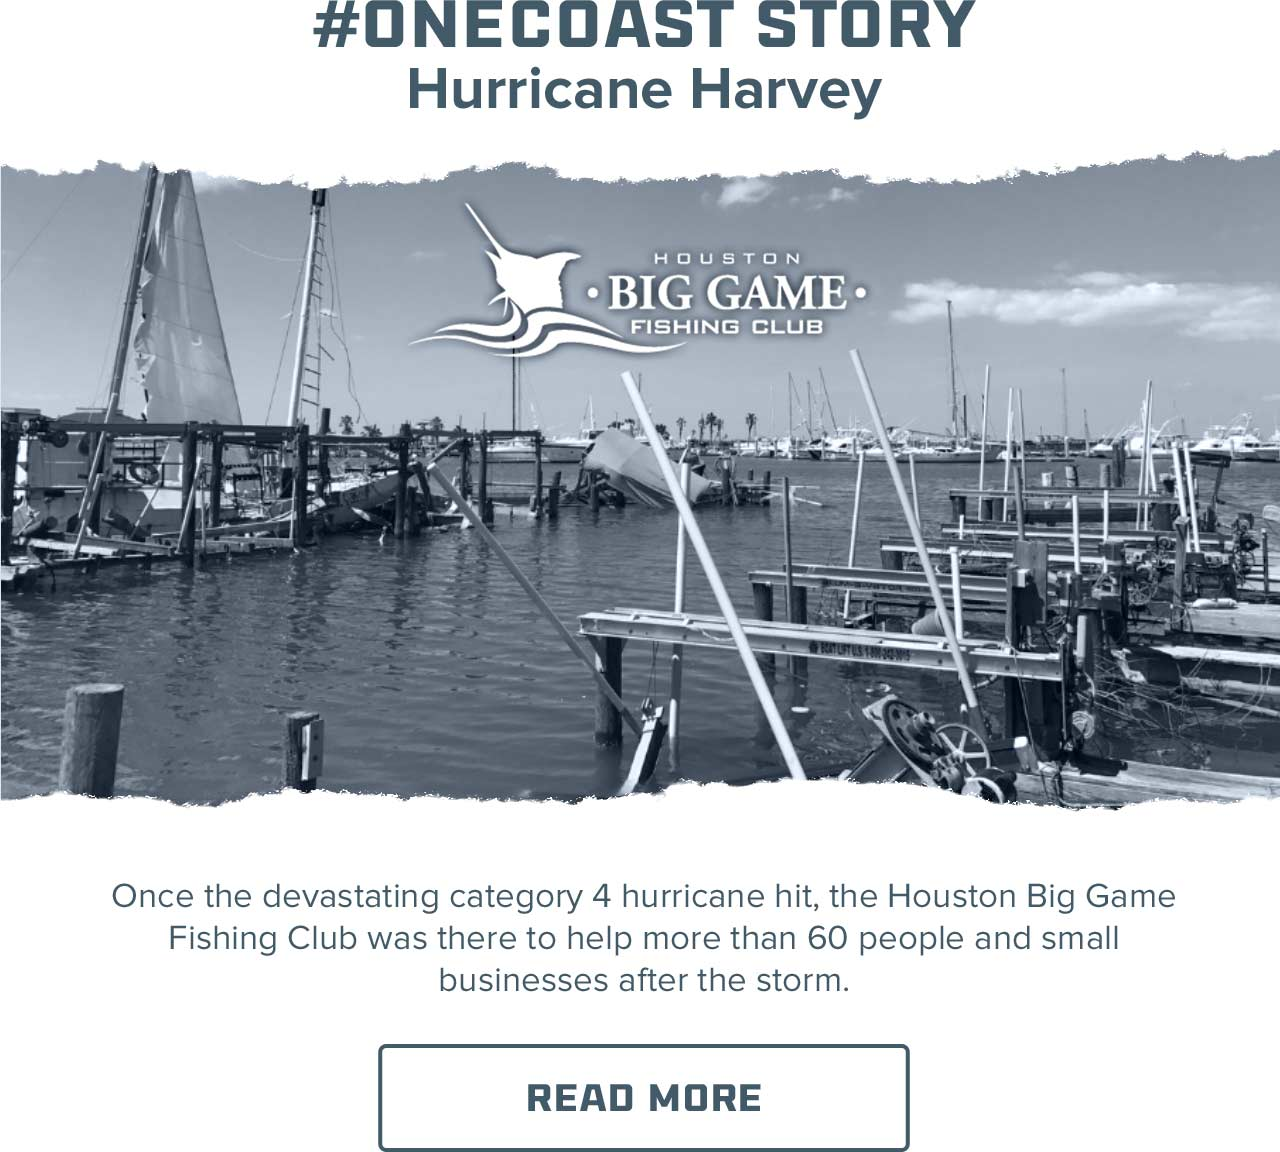 #One Coast Story: Houston Big Game Fishing Club